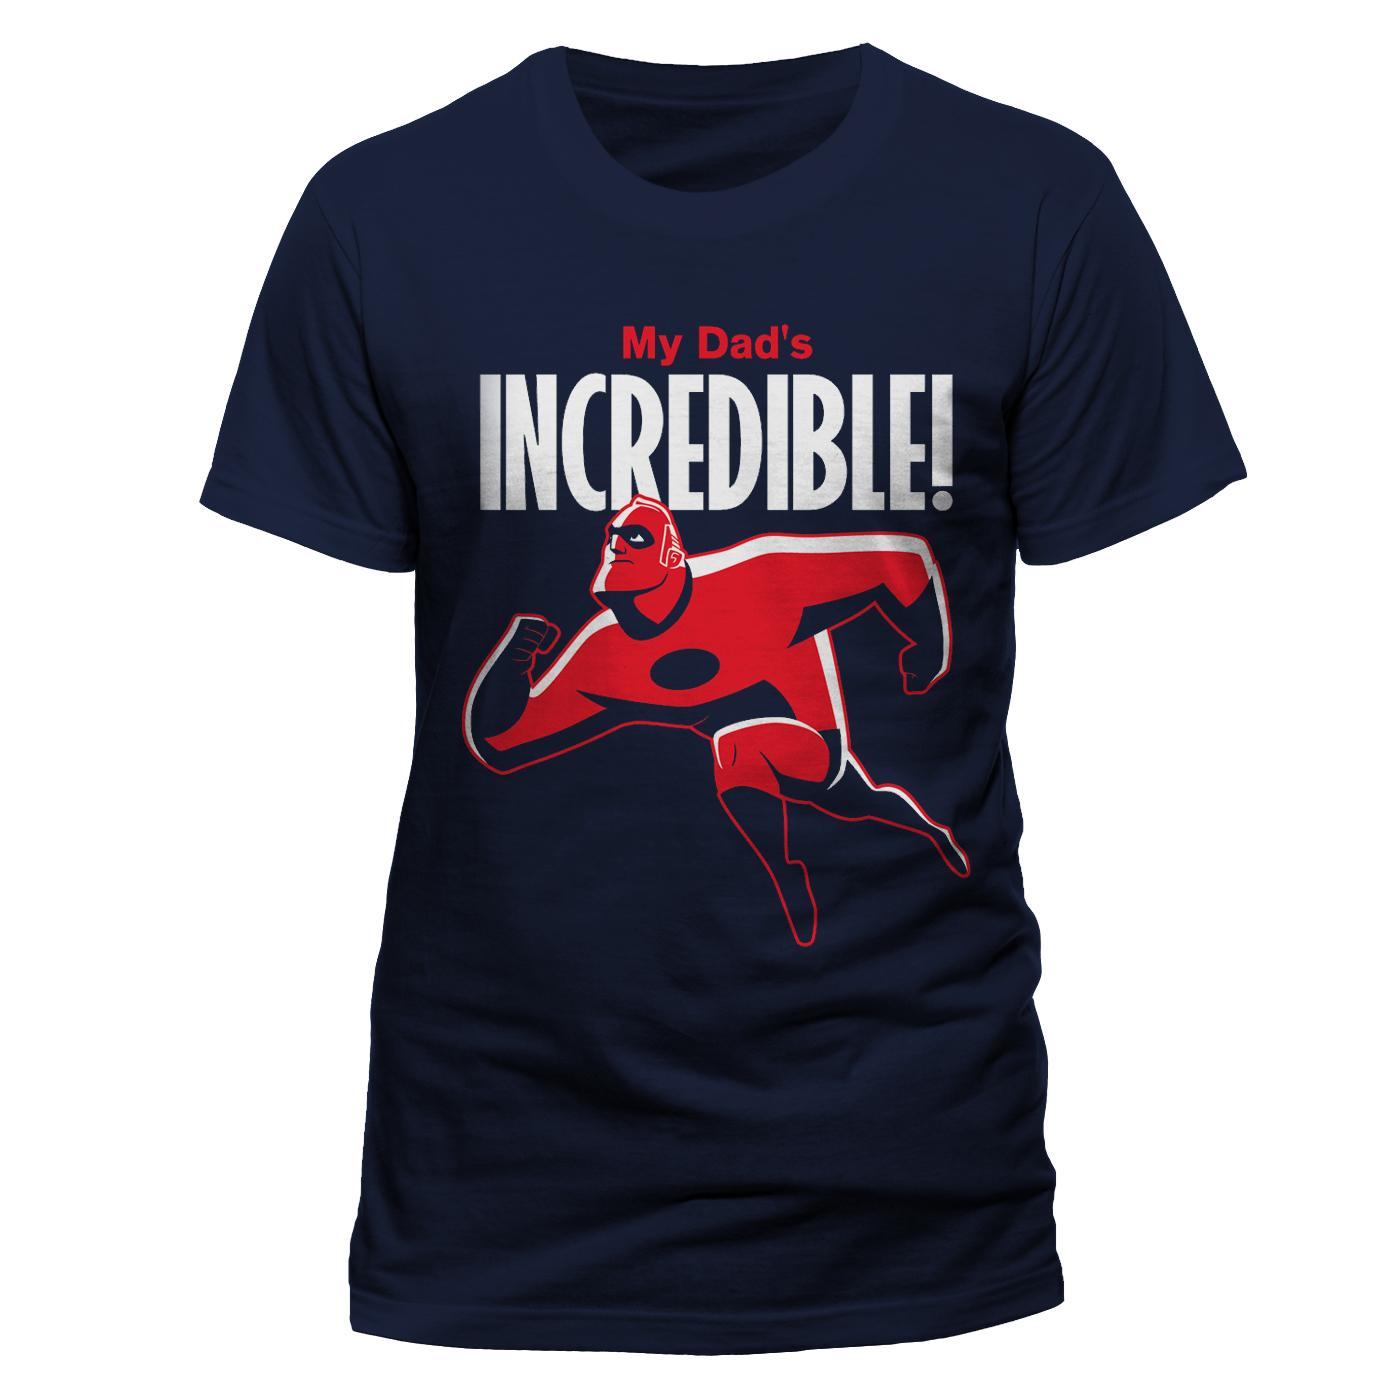 PCDIS787 Incredibles 2 My Dad's Incredible – Navy